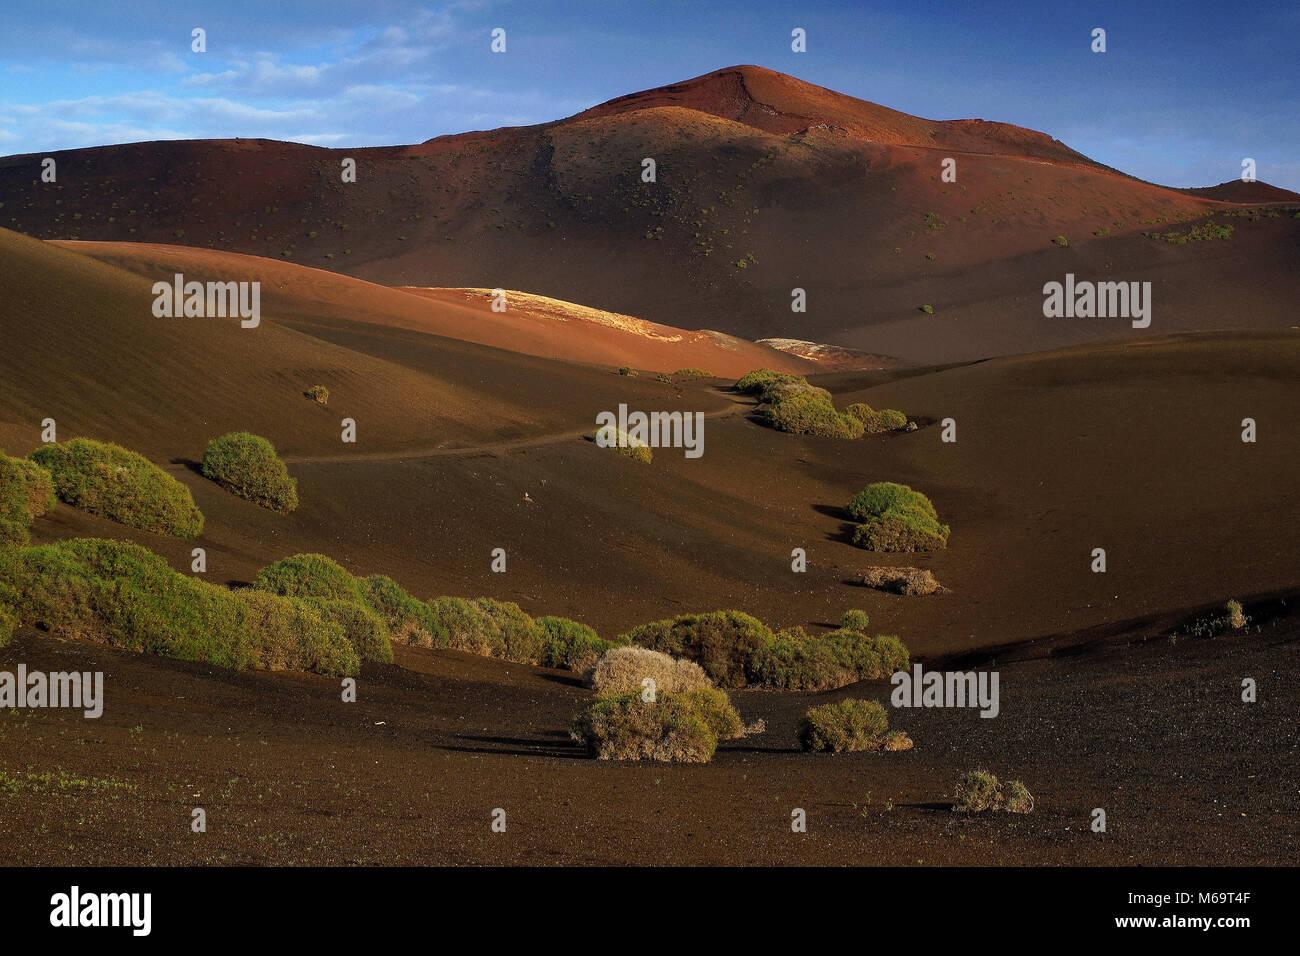 Canary Islands, Lanzarote, Timanfaya Nationalpark, Duenenlandscape, - Stock Image